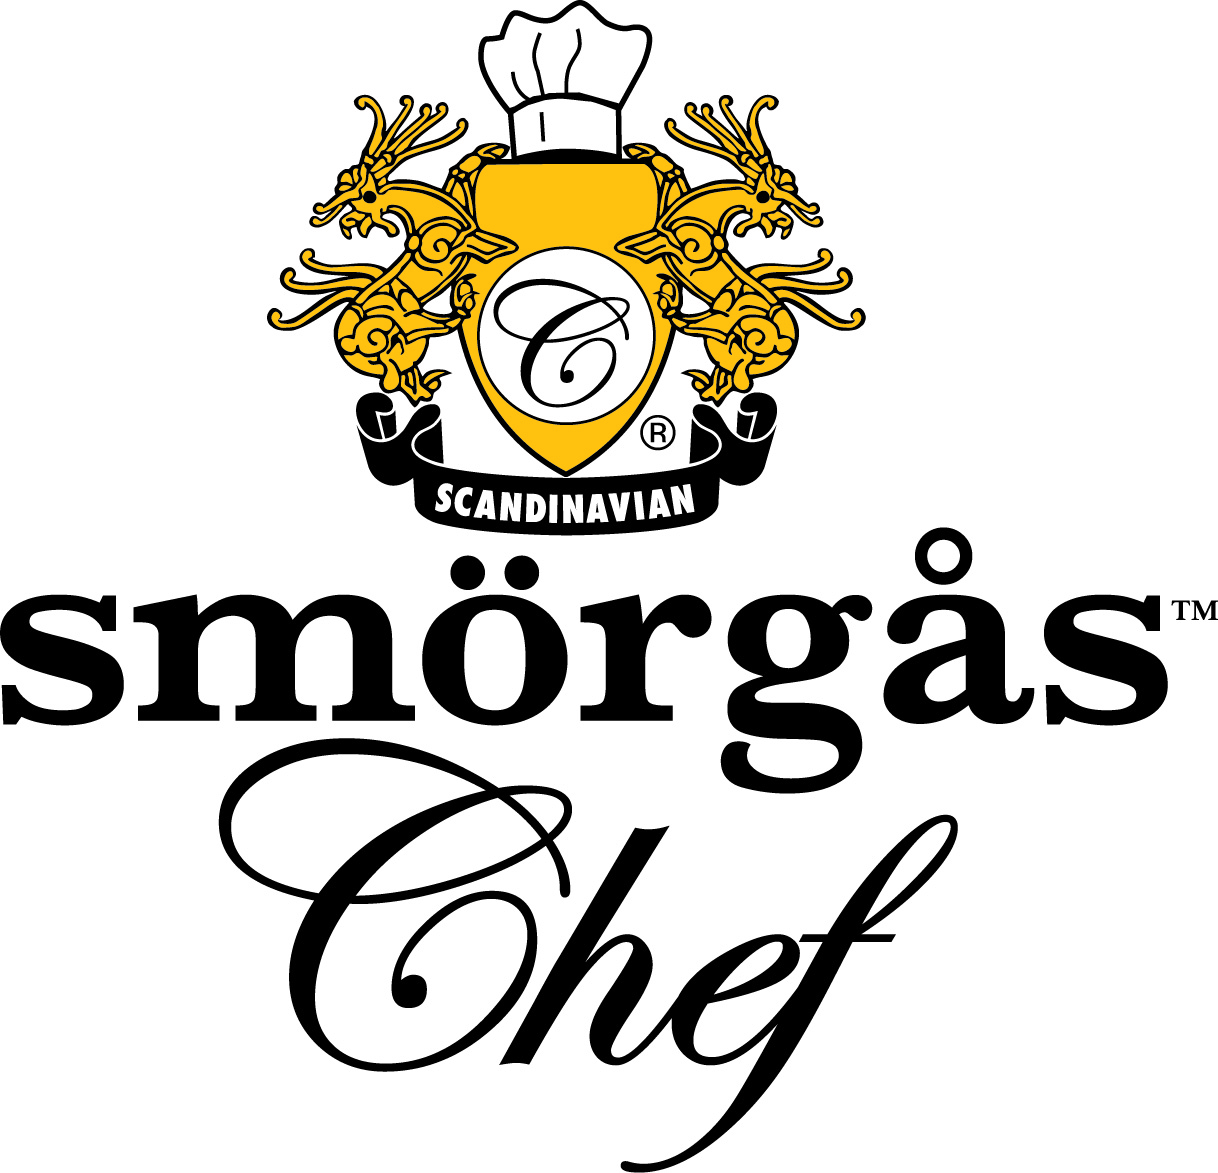 Smorgas Chef